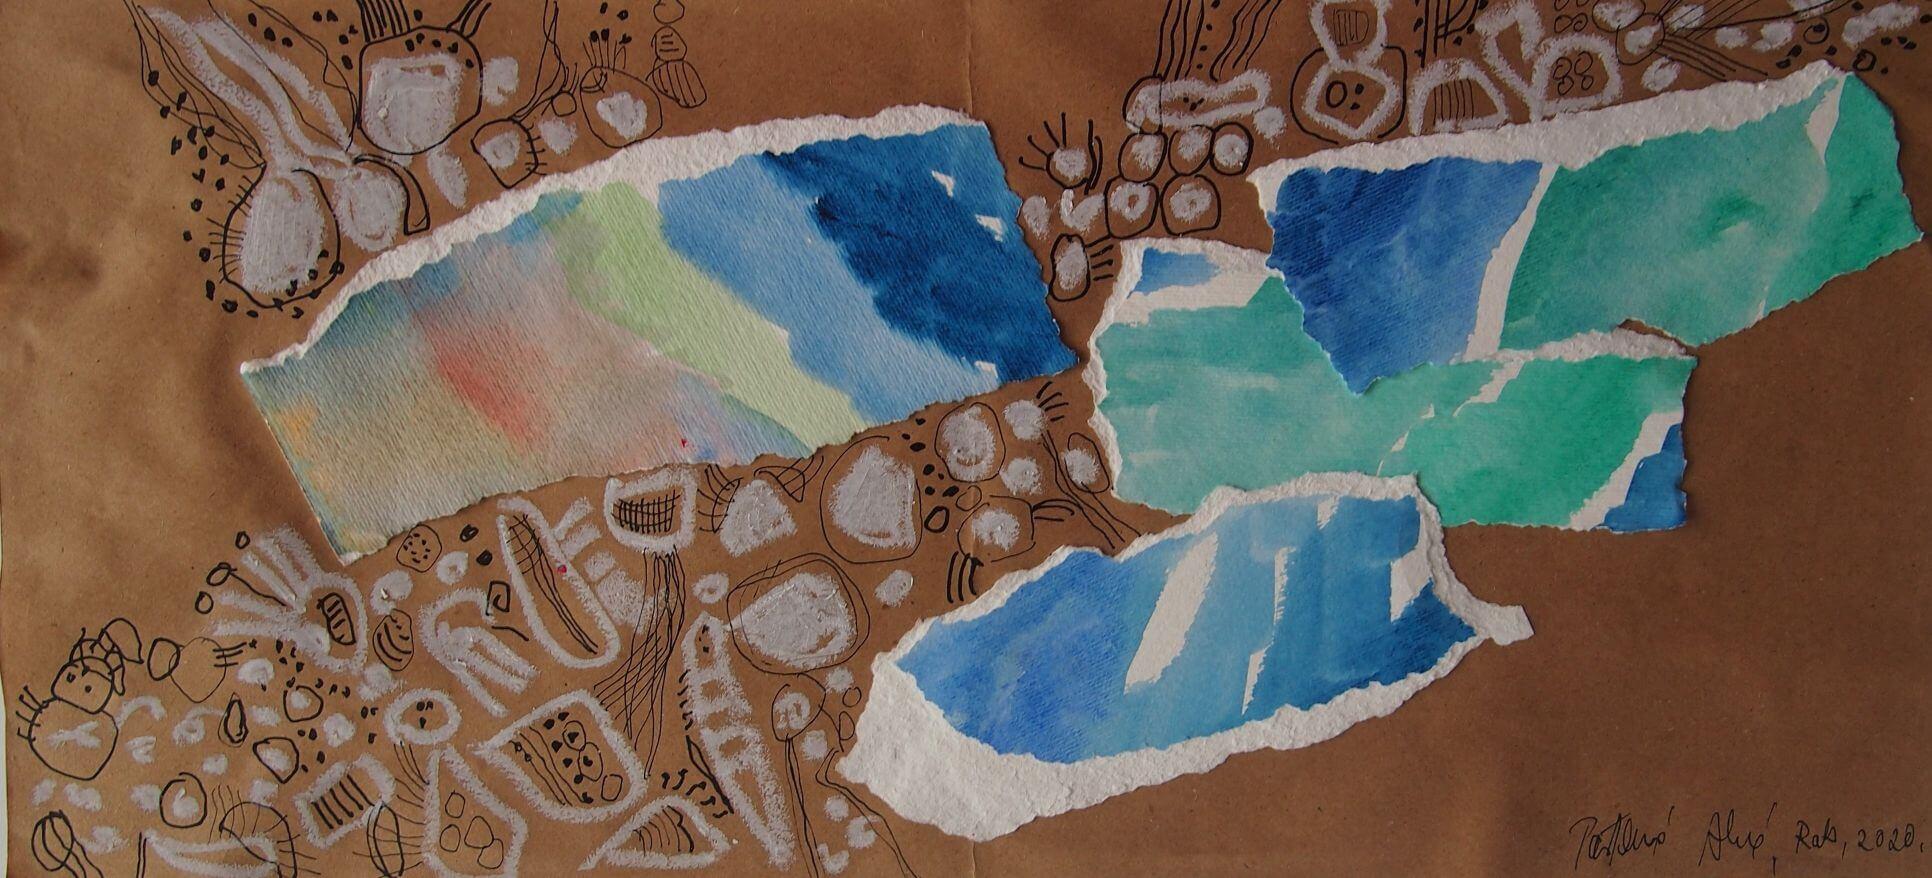 Sljuncana plaza, kolaz, 21 x 45,5 cm